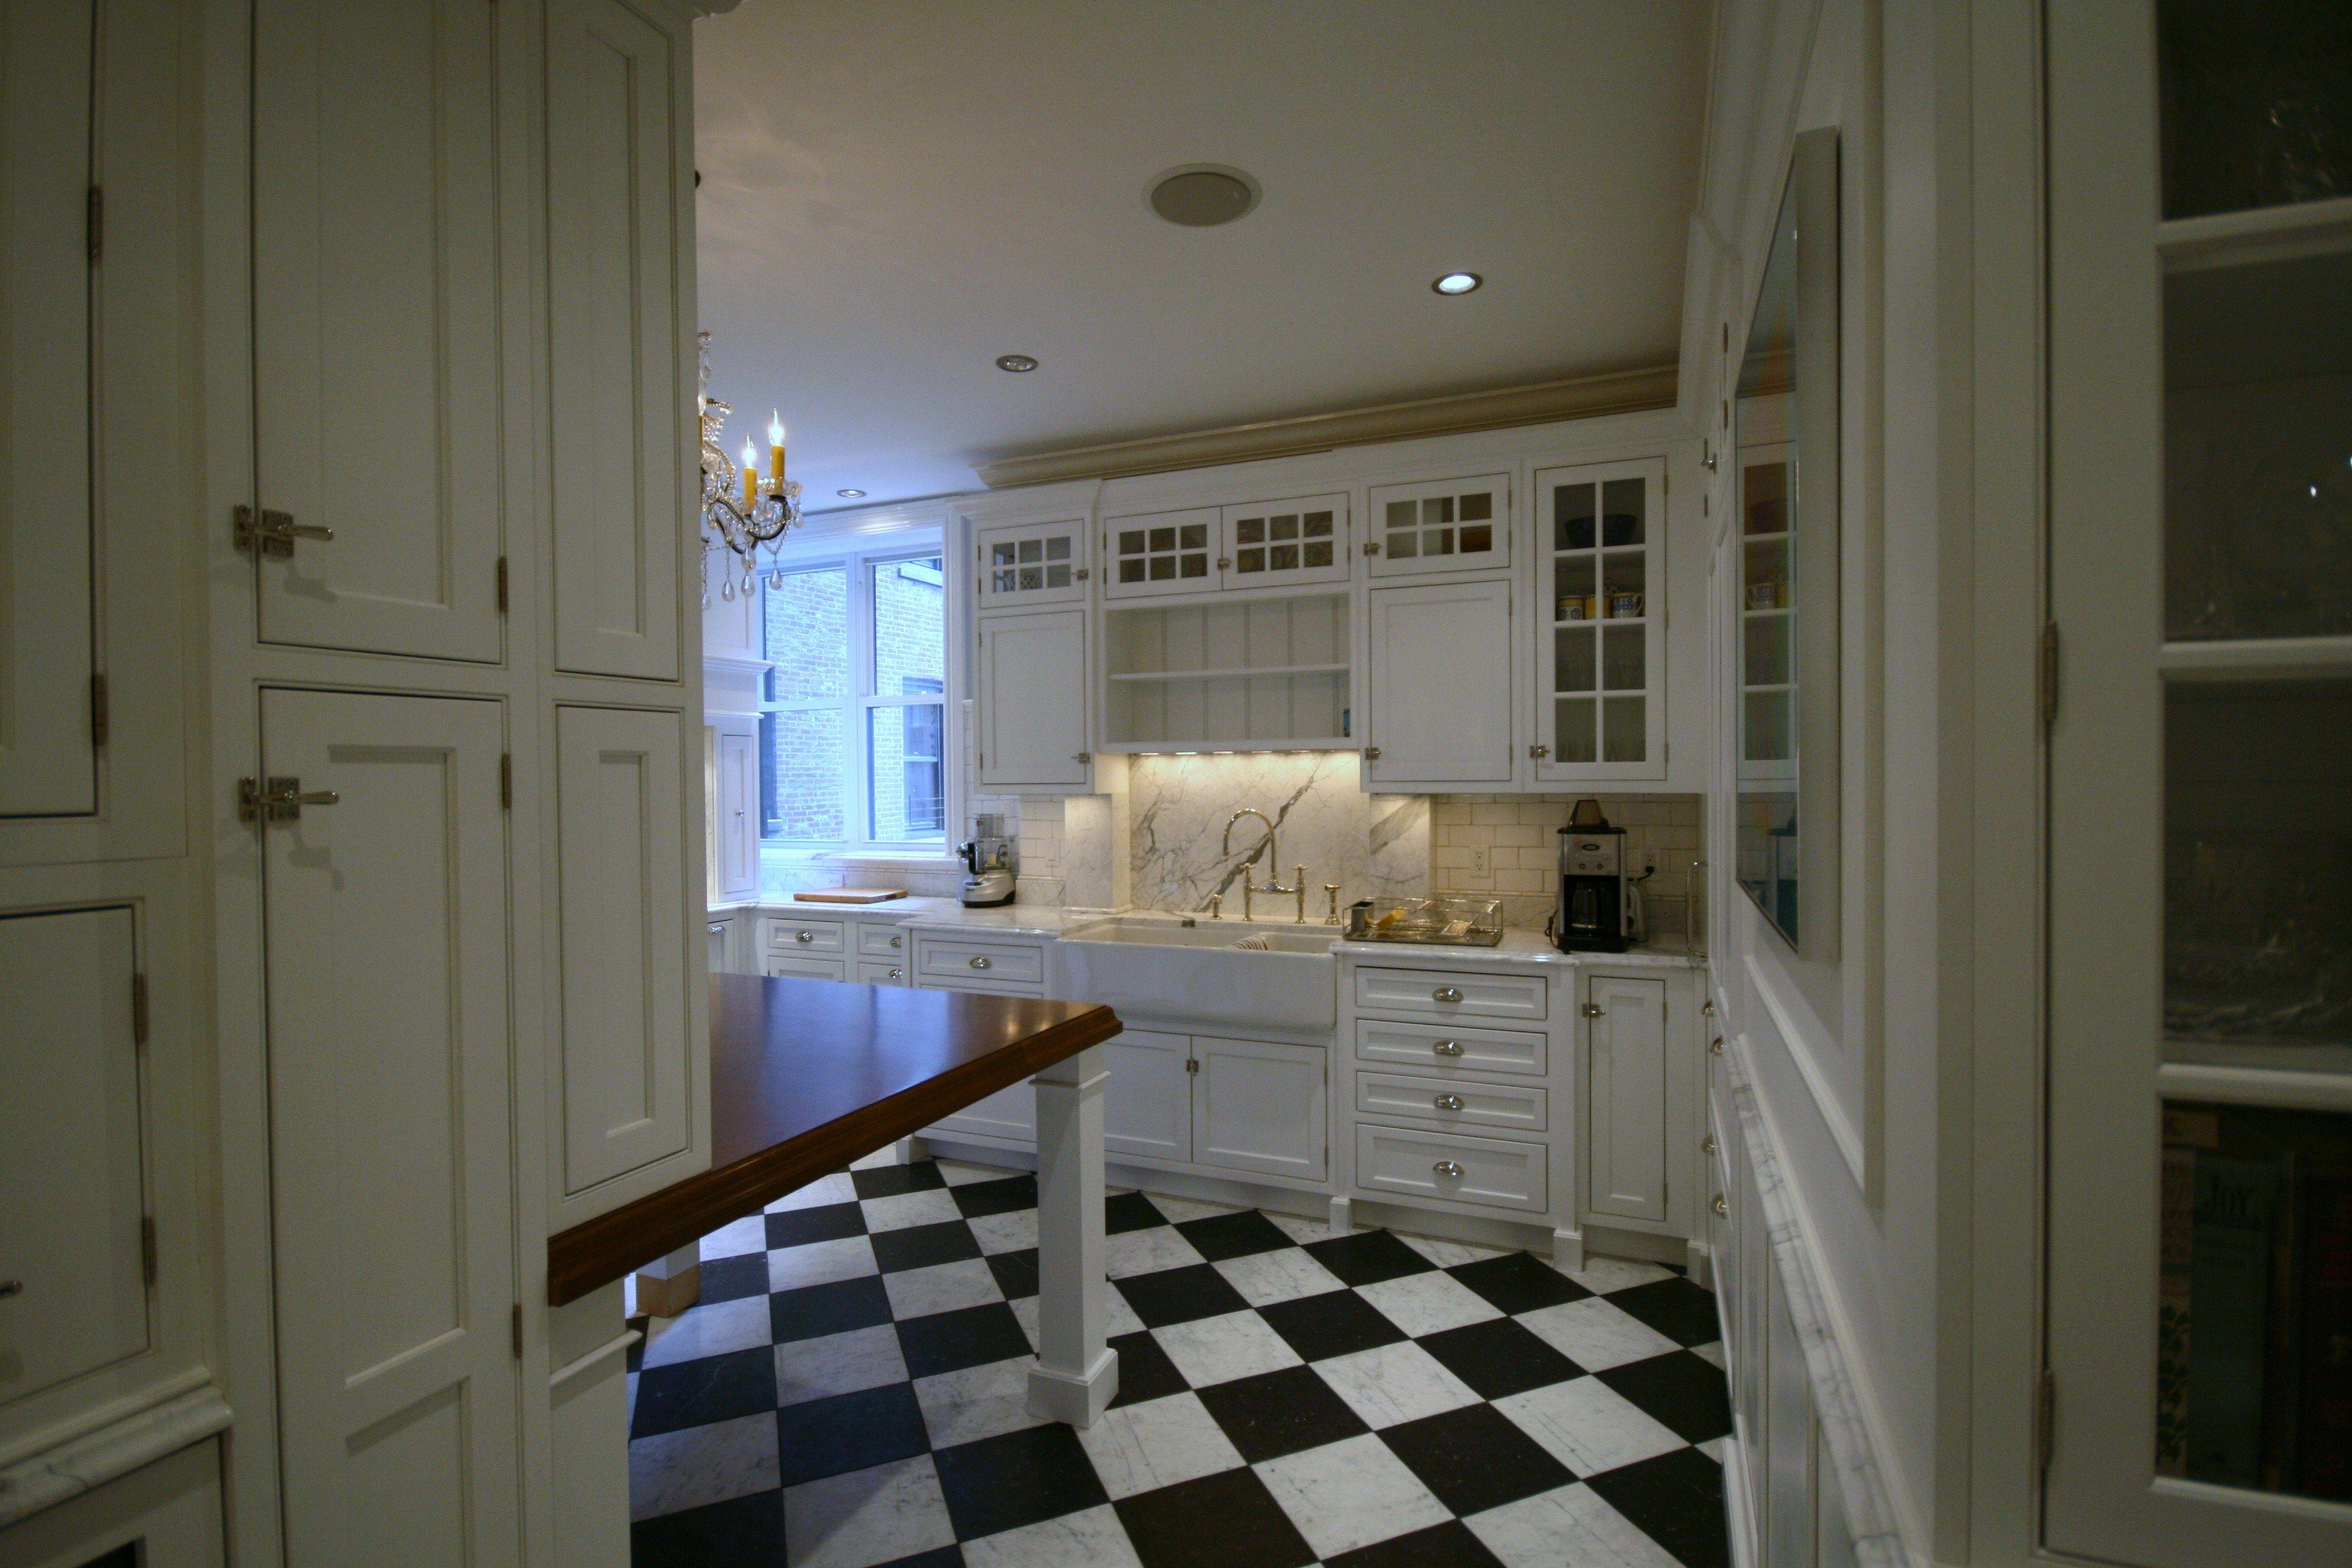 #Kitchen #Renovation #Manhattan #NYC #General #Contractor | General  Contractor: